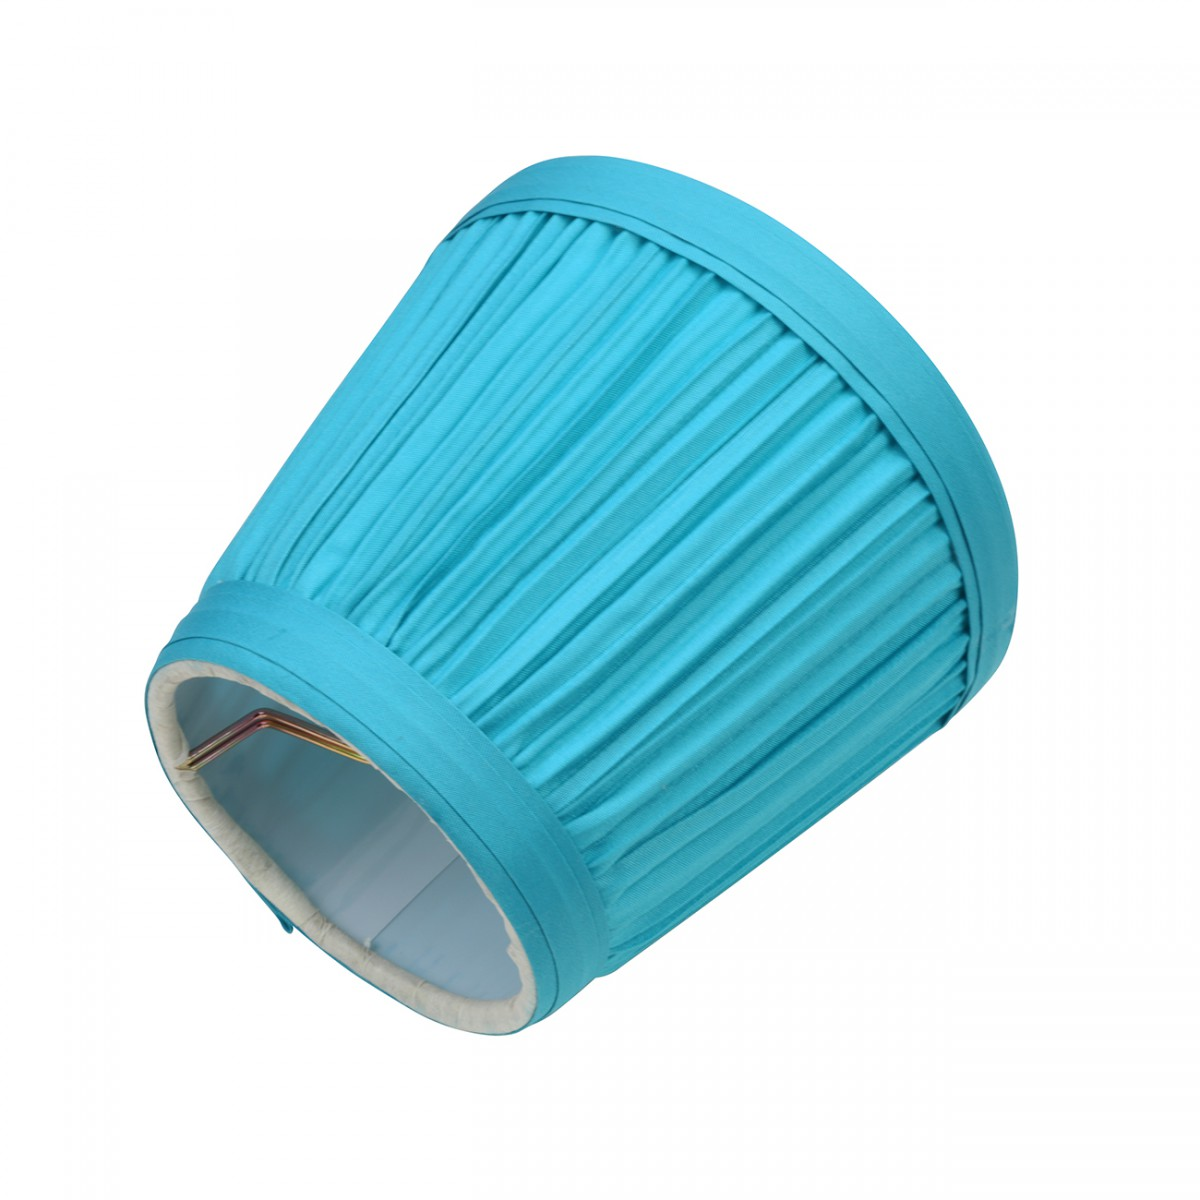 Lamp Shade Blue Fabric 4 116 Mini Clip On Clip On Lamp Shades Small Blue Clipon Lamp Shade Candelabra Lamp Shade